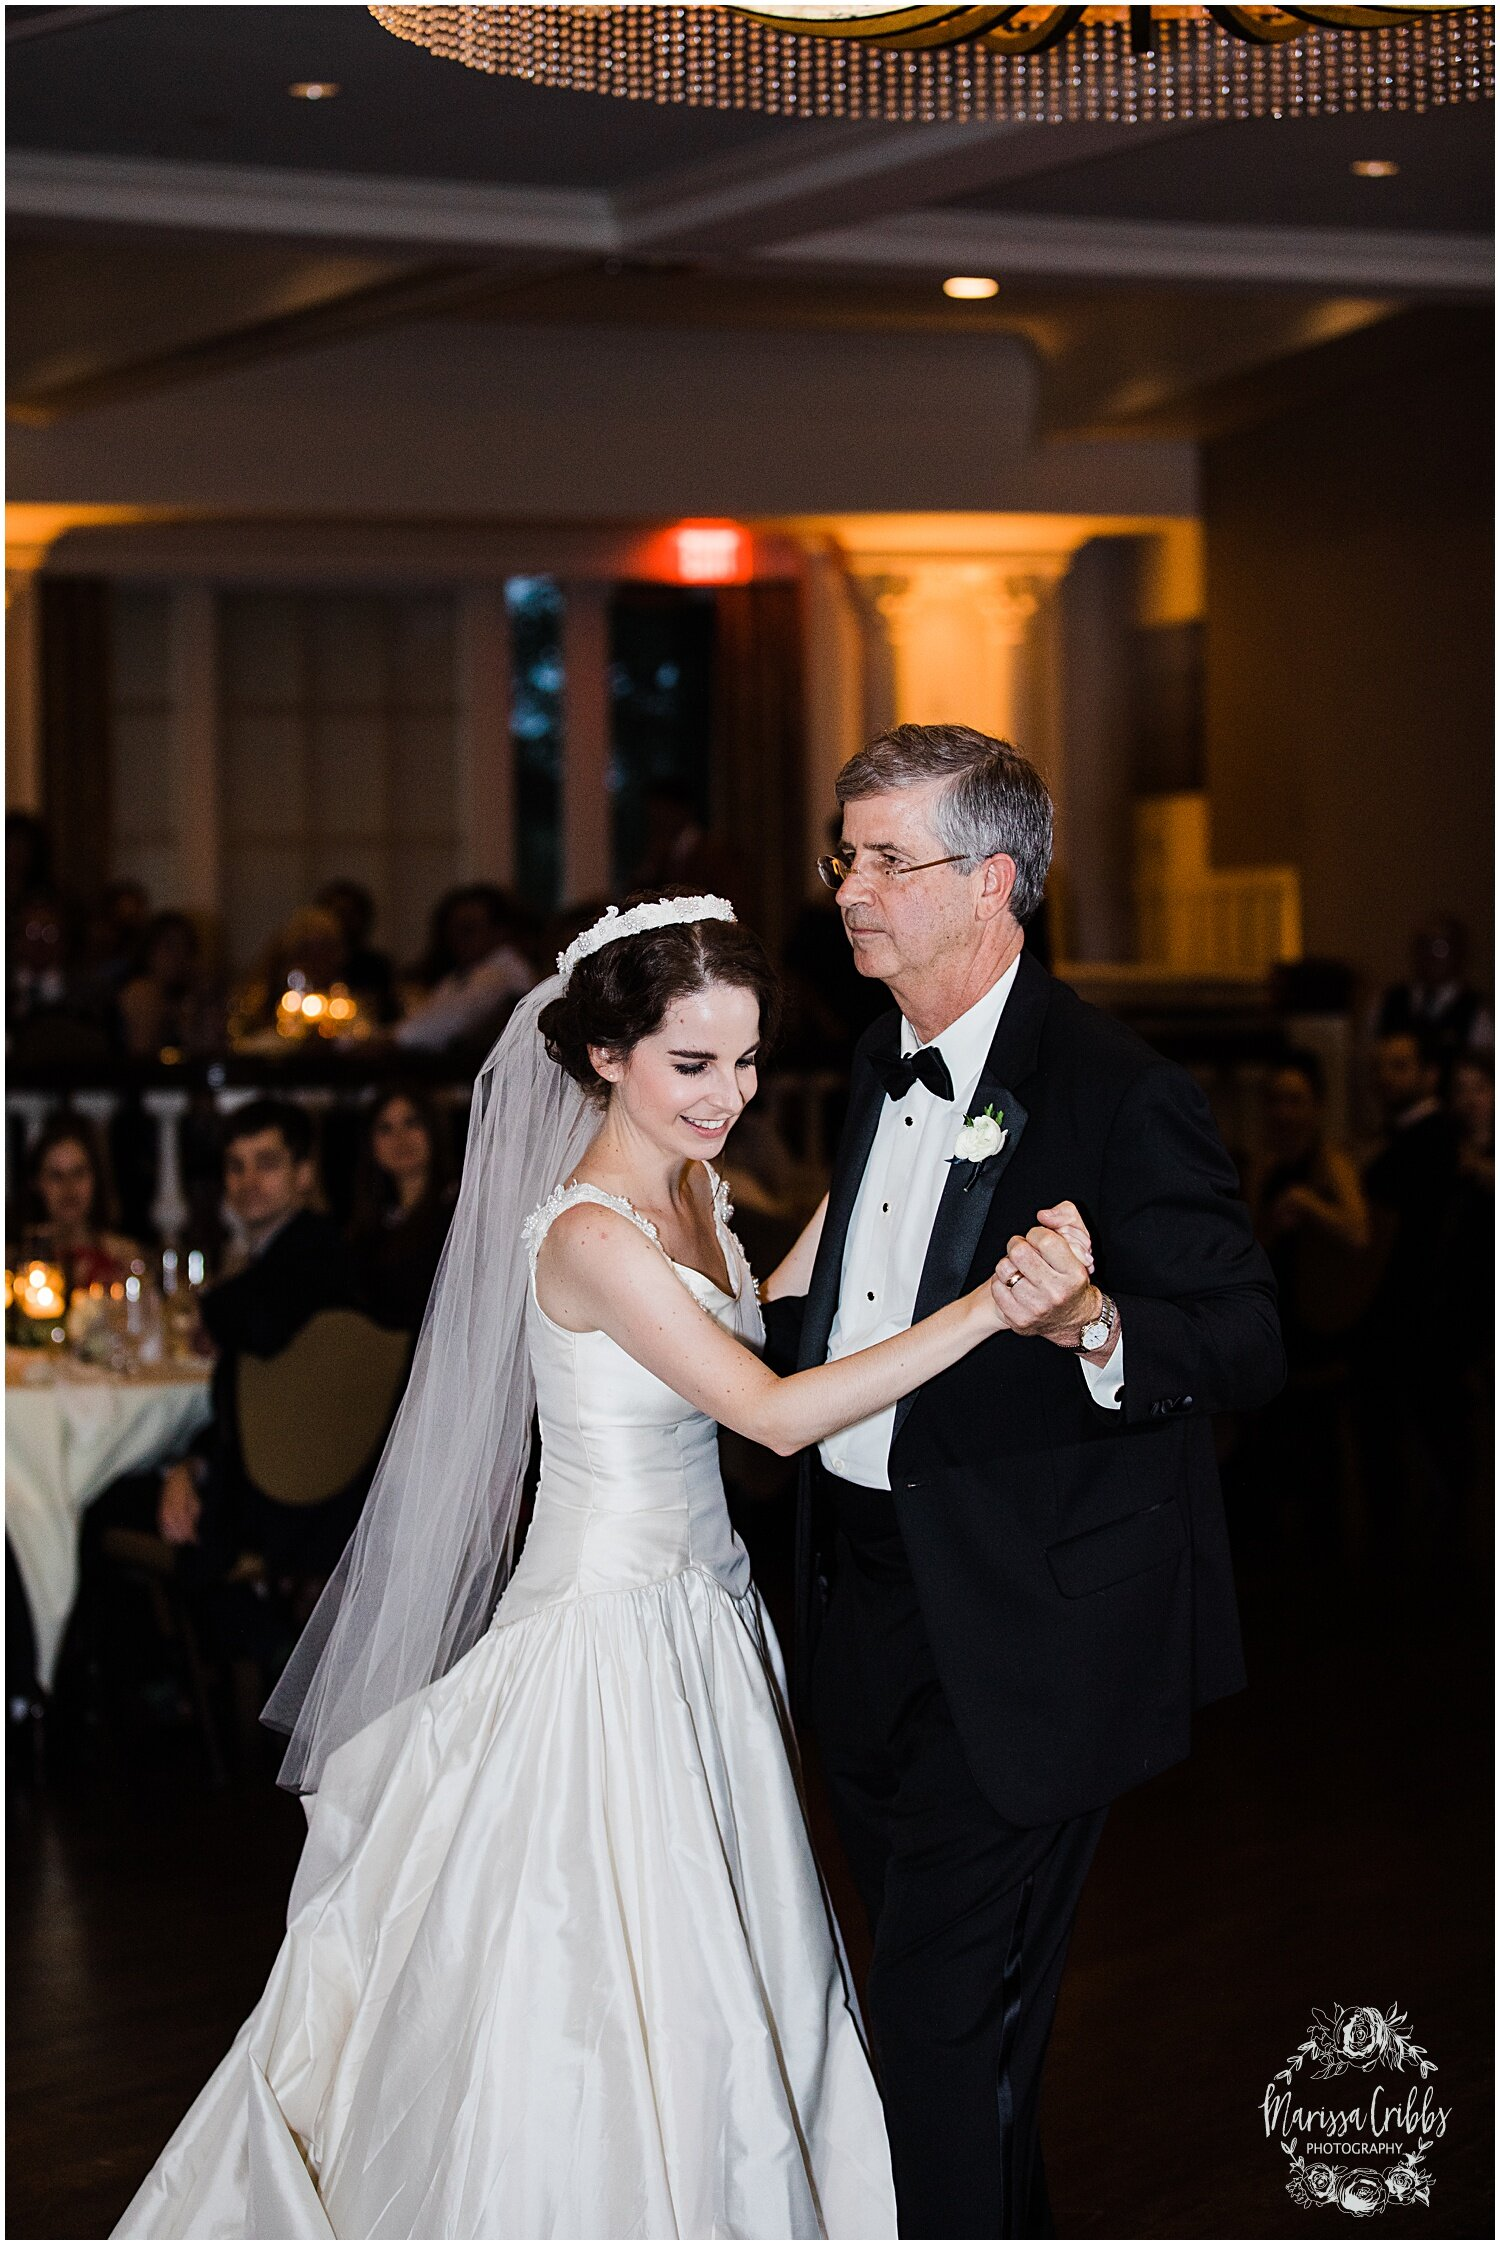 TYLER & CAROLINE MARRIED BLOG | MARISSA CRIBBS PHOTOGRAPHY | THE CARRIAGE CLUB | KANSAS CITY WEDDING PHOTOS_9285.jpg